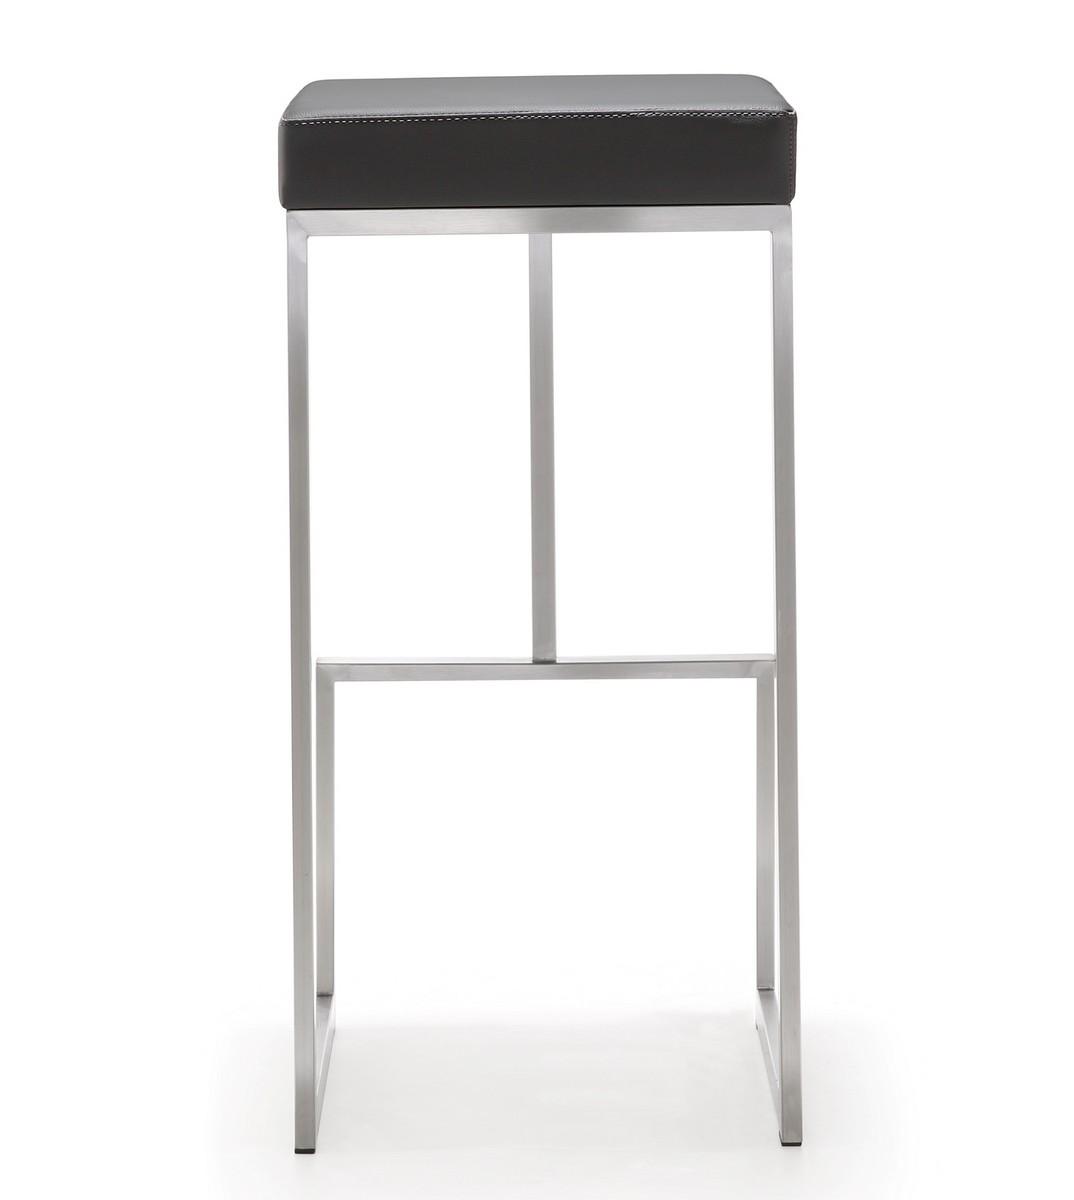 TOV Furniture Ferrara Grey Stainless Steel Barstool - Set of 2